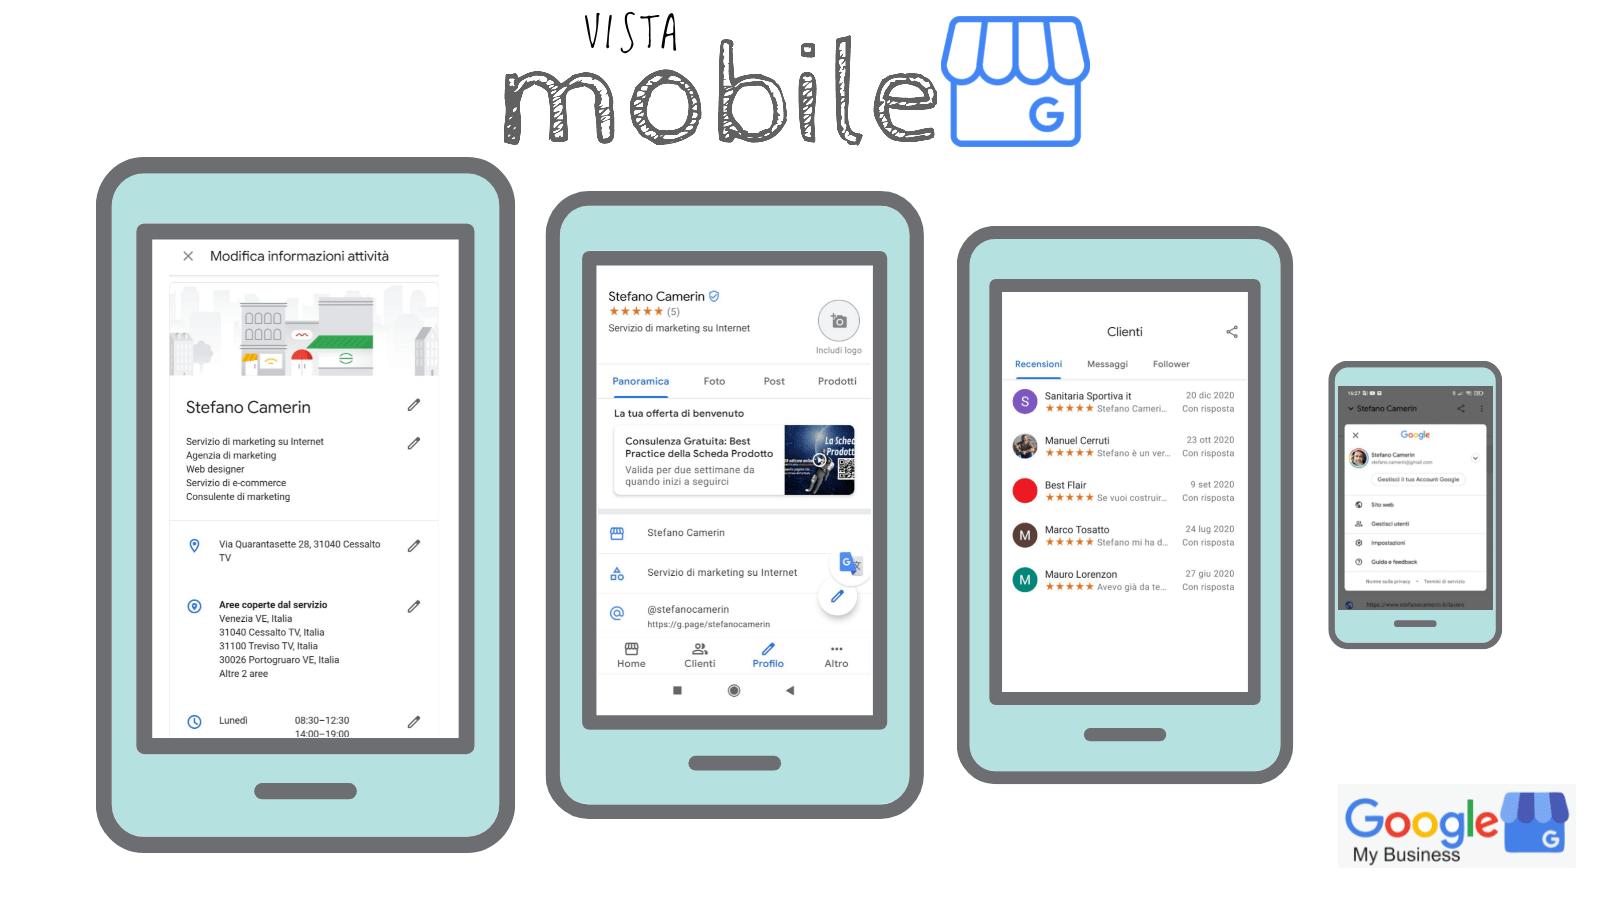 Infografica dei vari Mobile per la App Google My Business